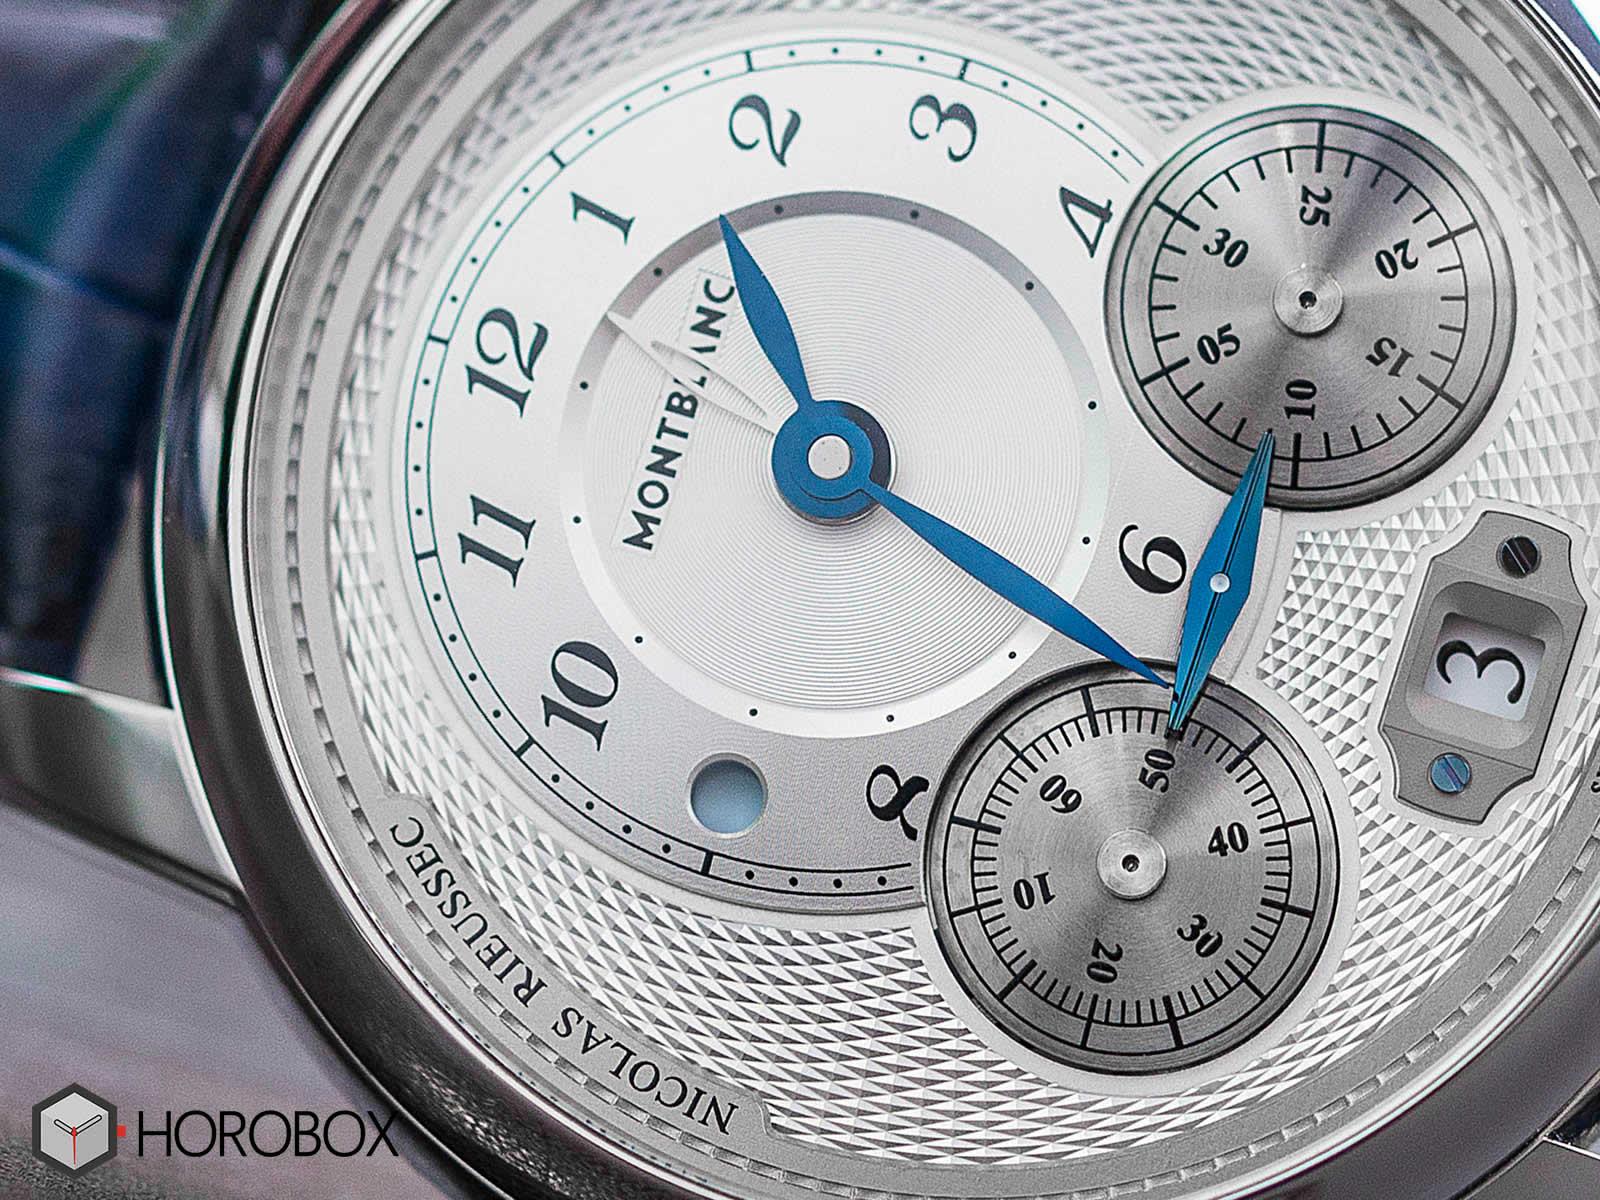 118537-montblanc-star-legacy-nicolas-rieussec-chronograph-4.jpg